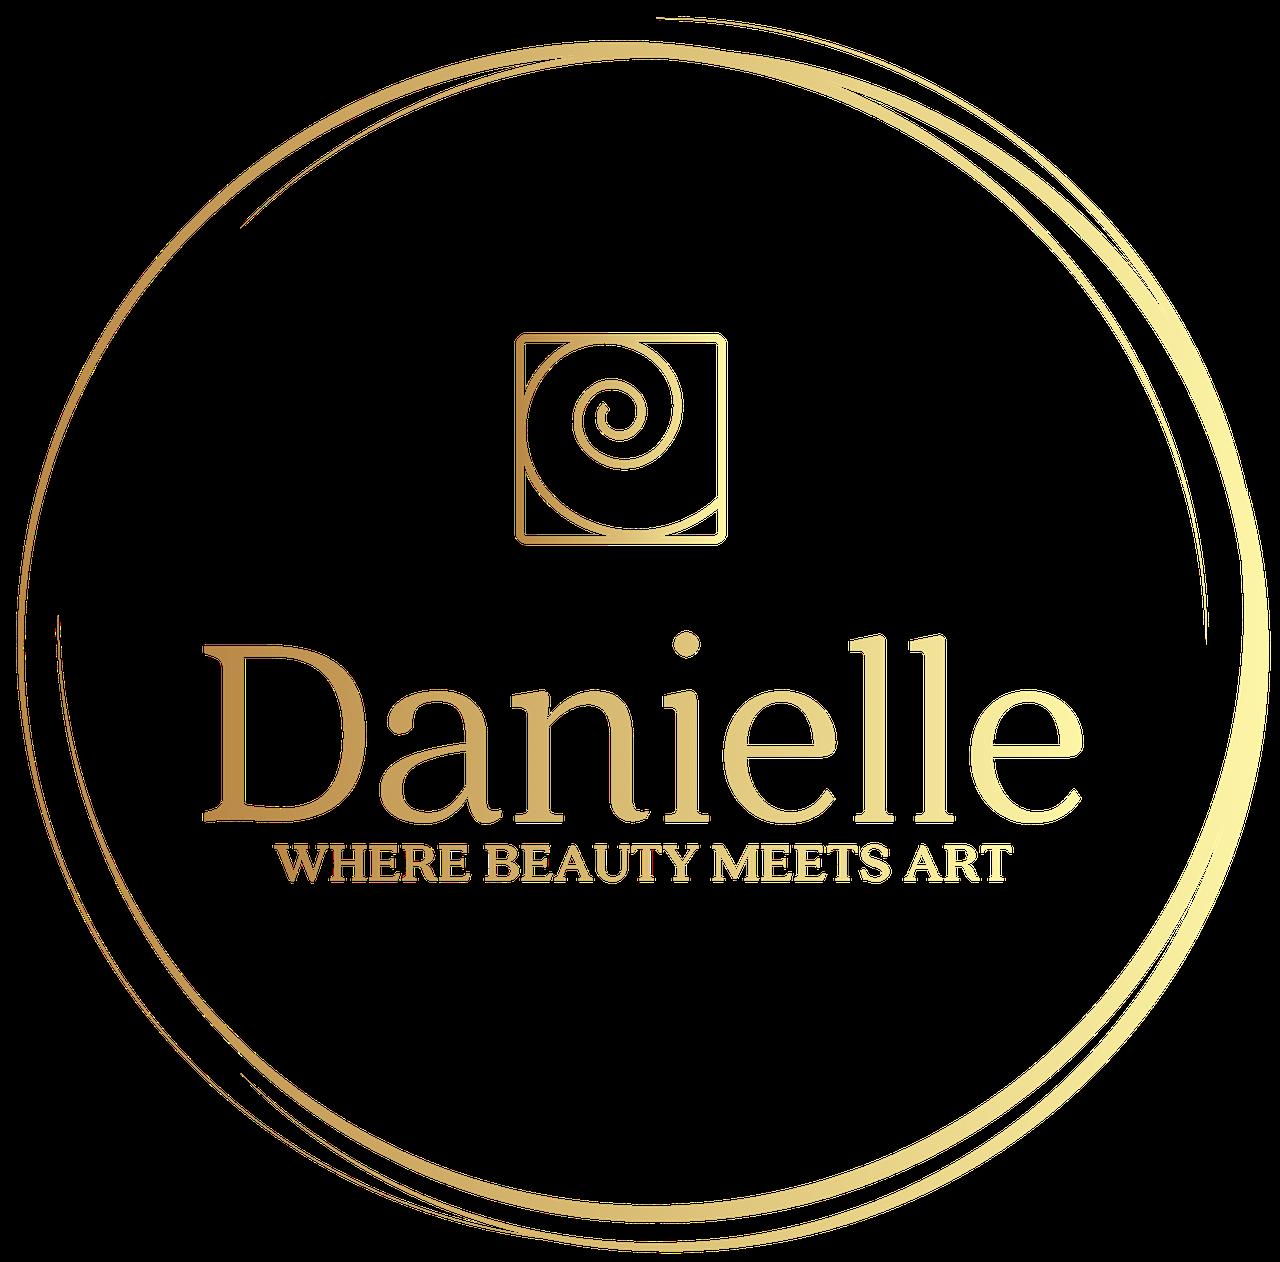 Danielle's Body and Skin Care